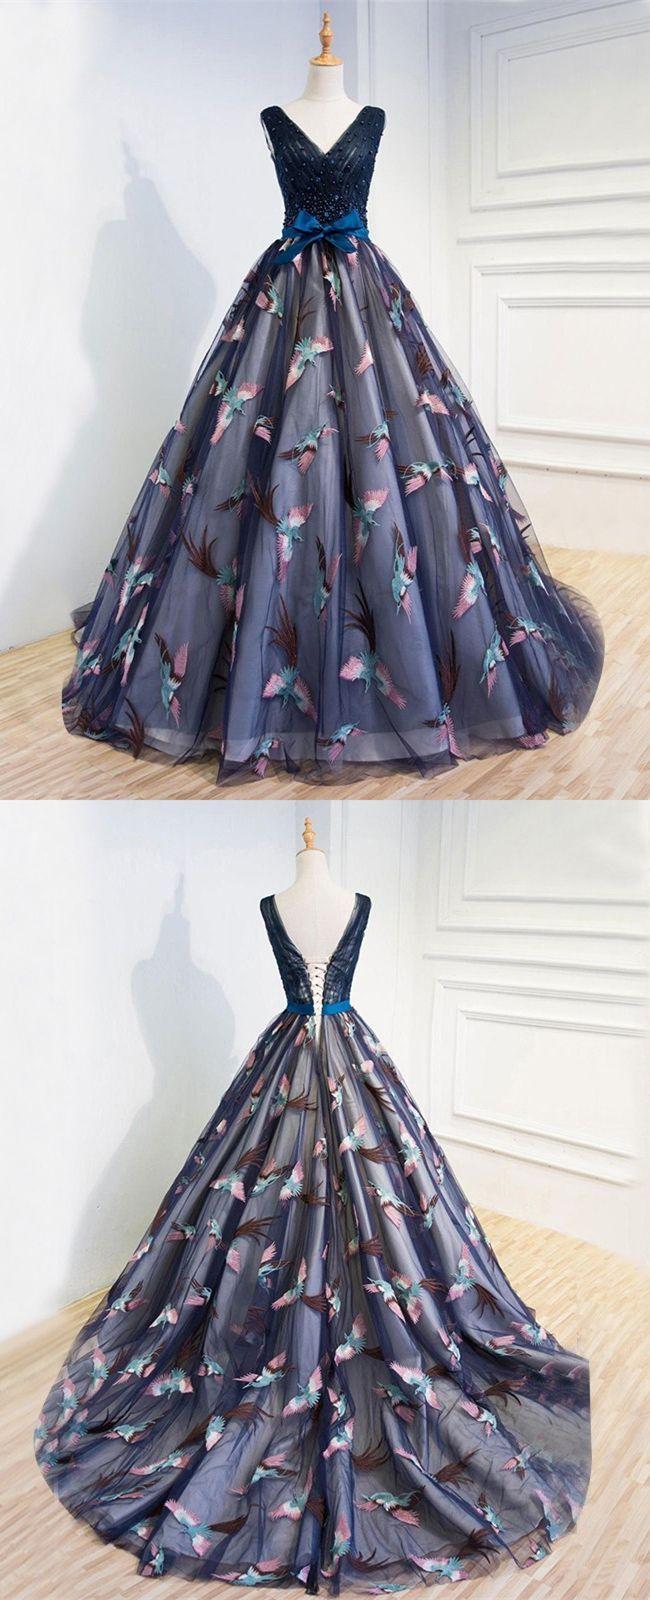 Unique dark blue prom dresses elegant ball gown evening dresses